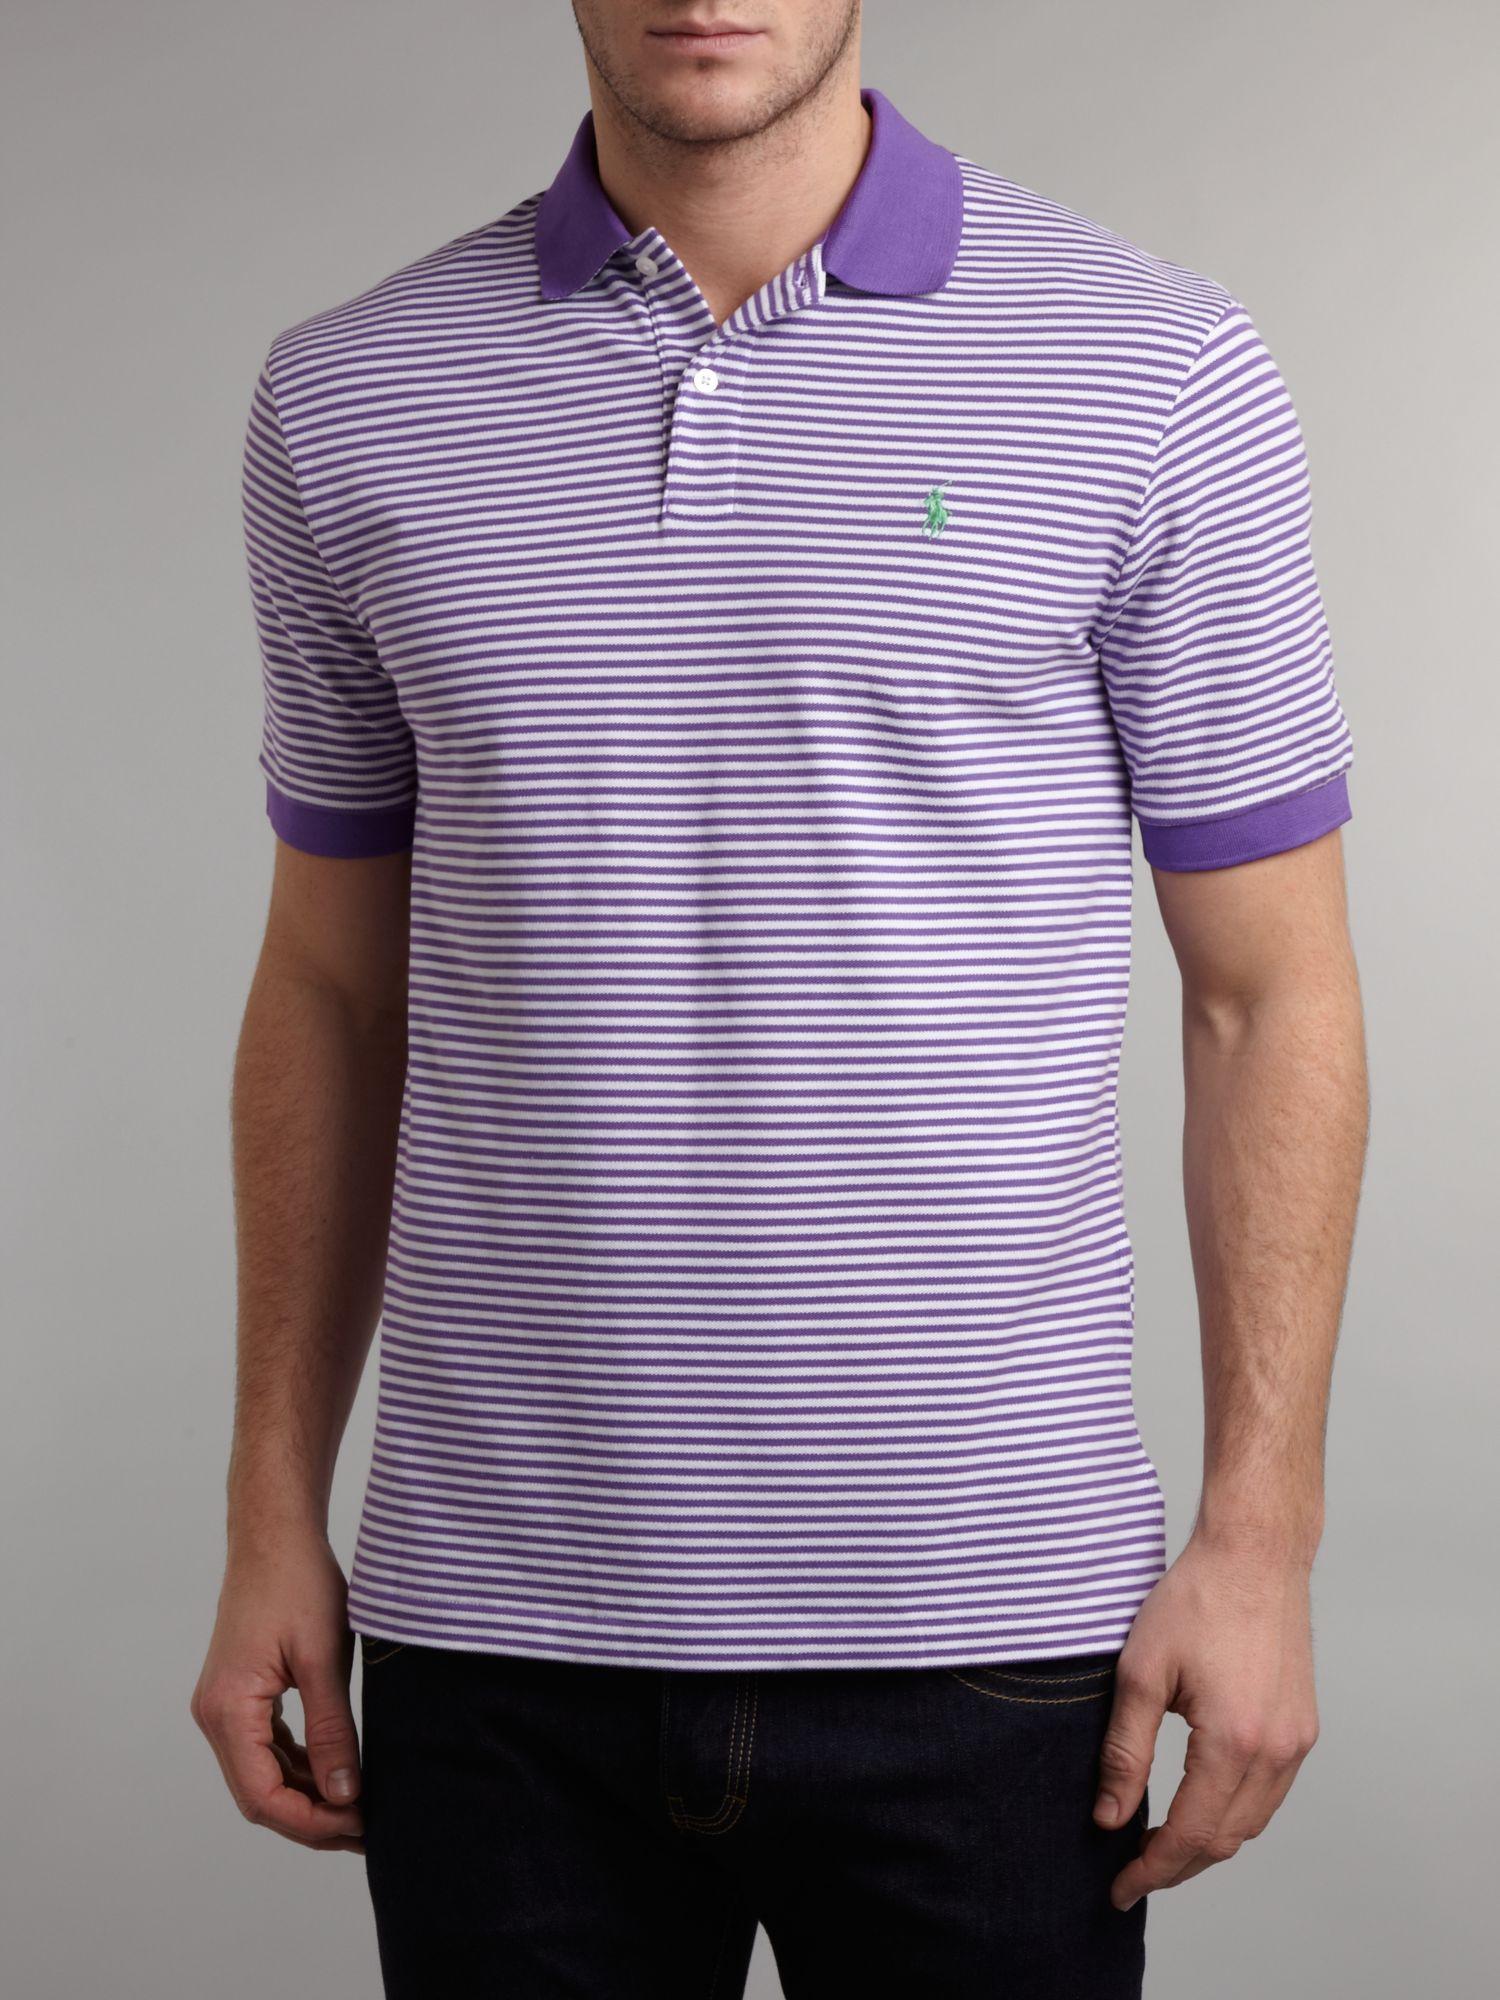 Well known Lyst - Ralph Lauren Golf Fine Striped Polo Shirt in Purple for Men PB29